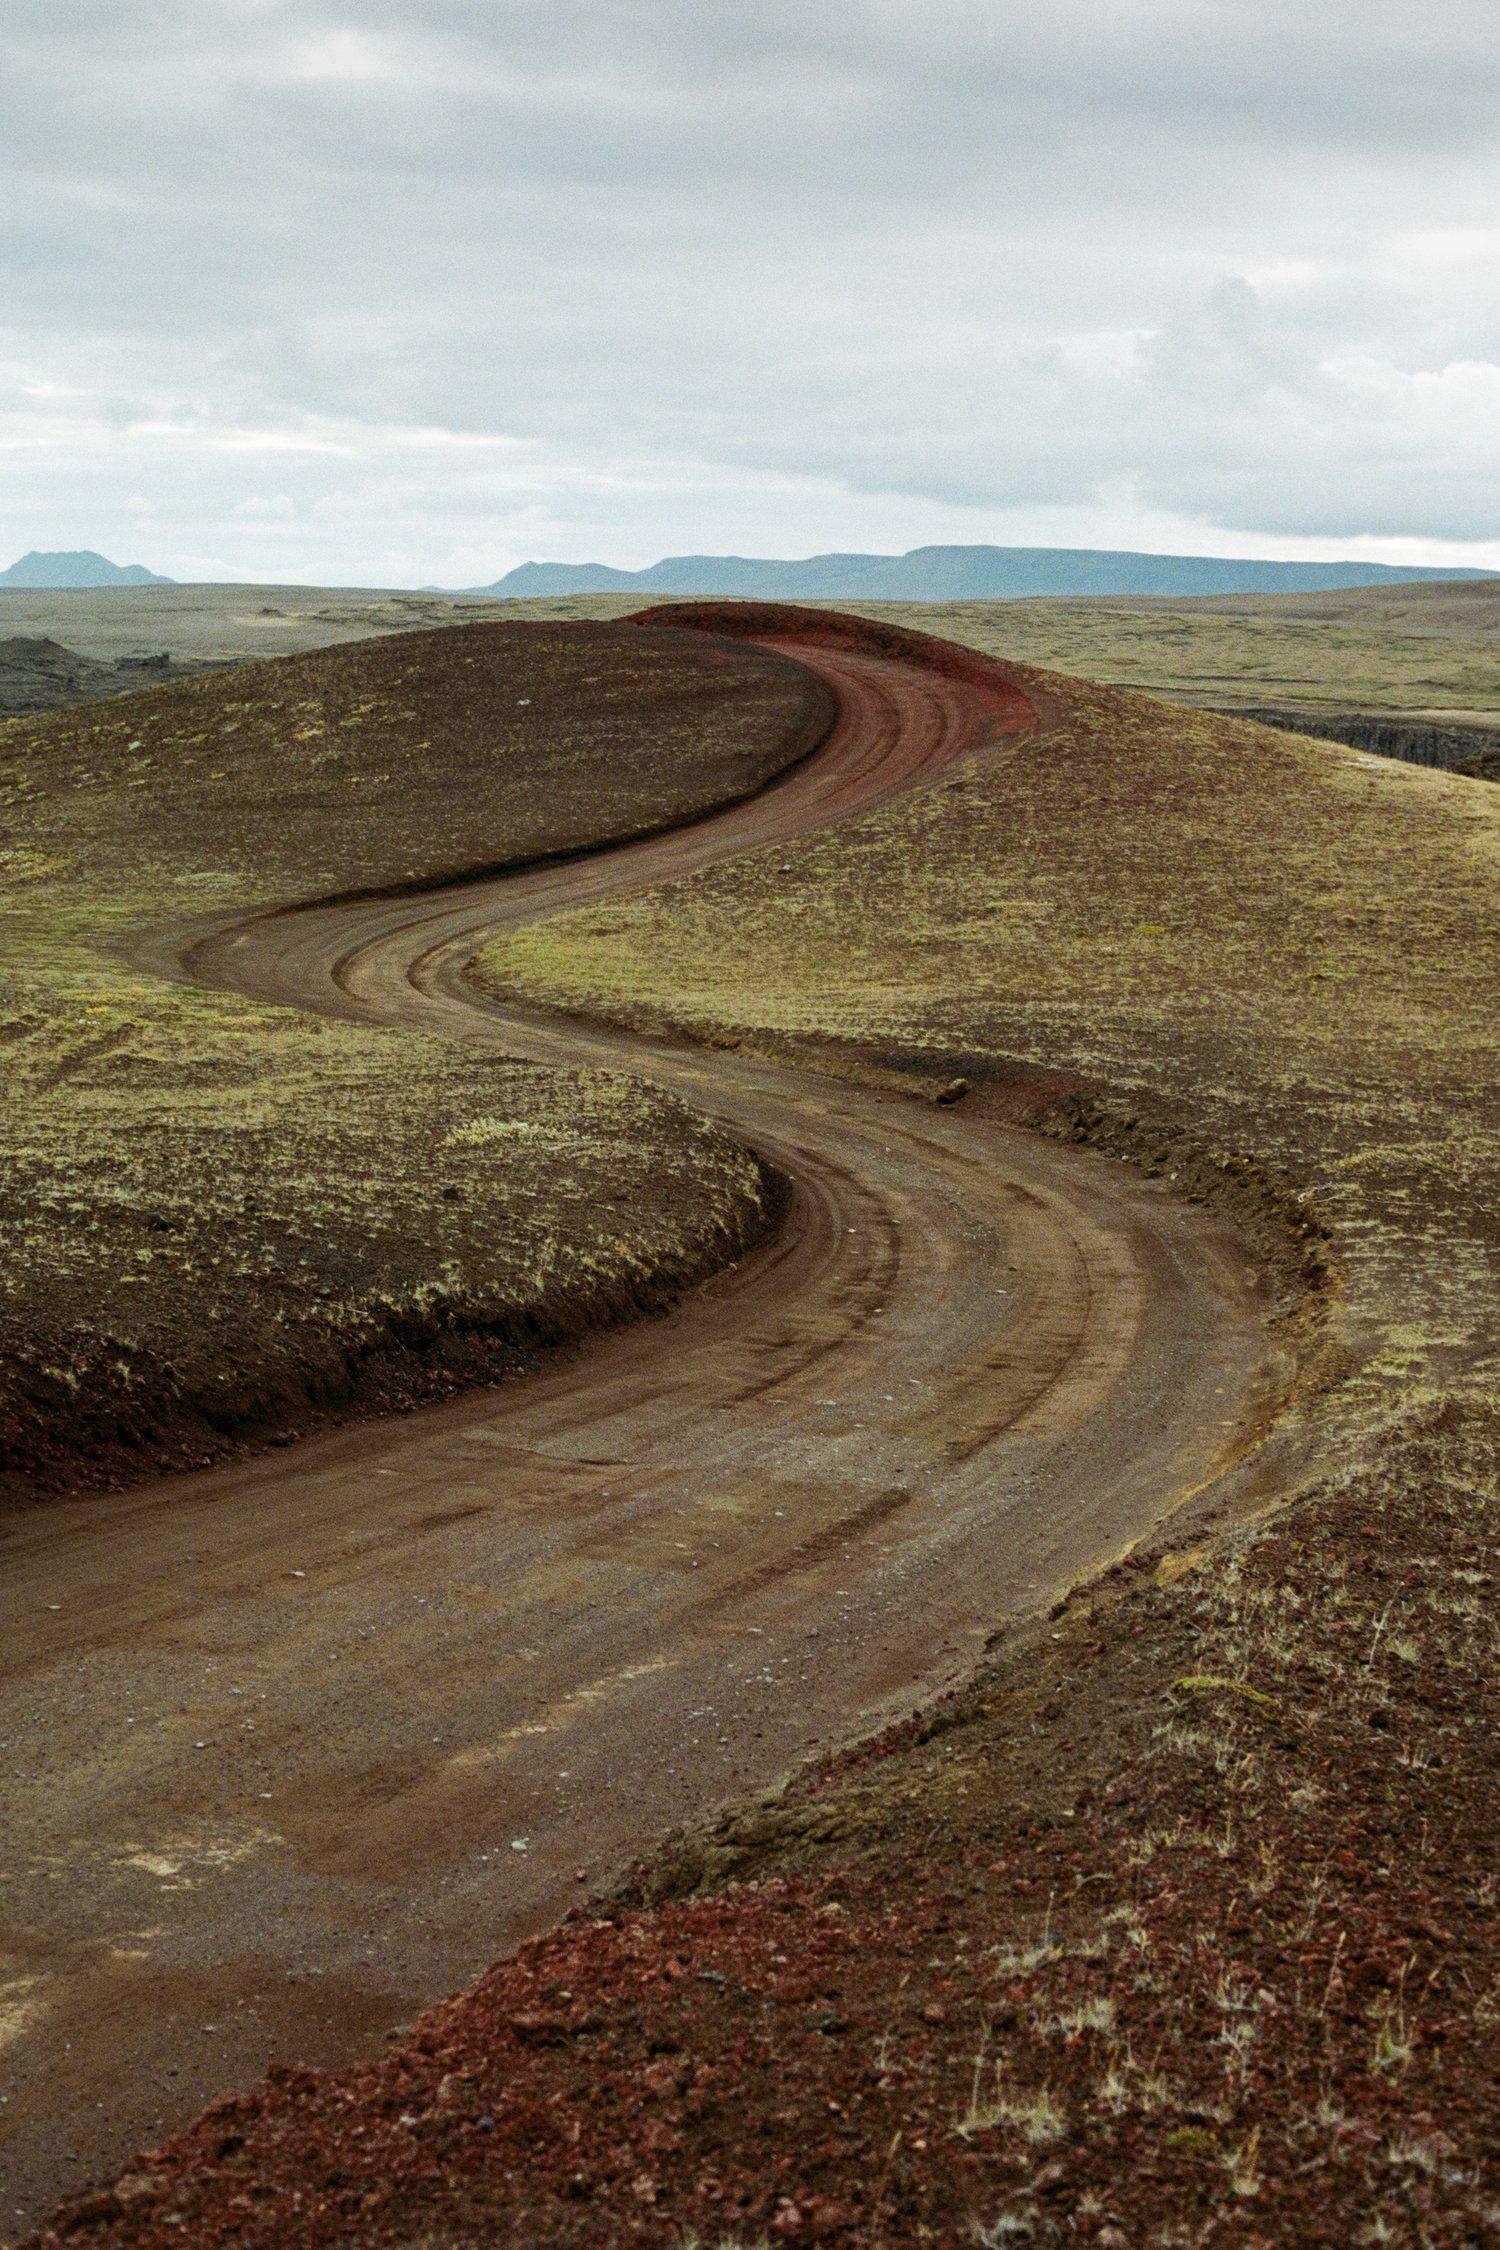 Image of icelandic road